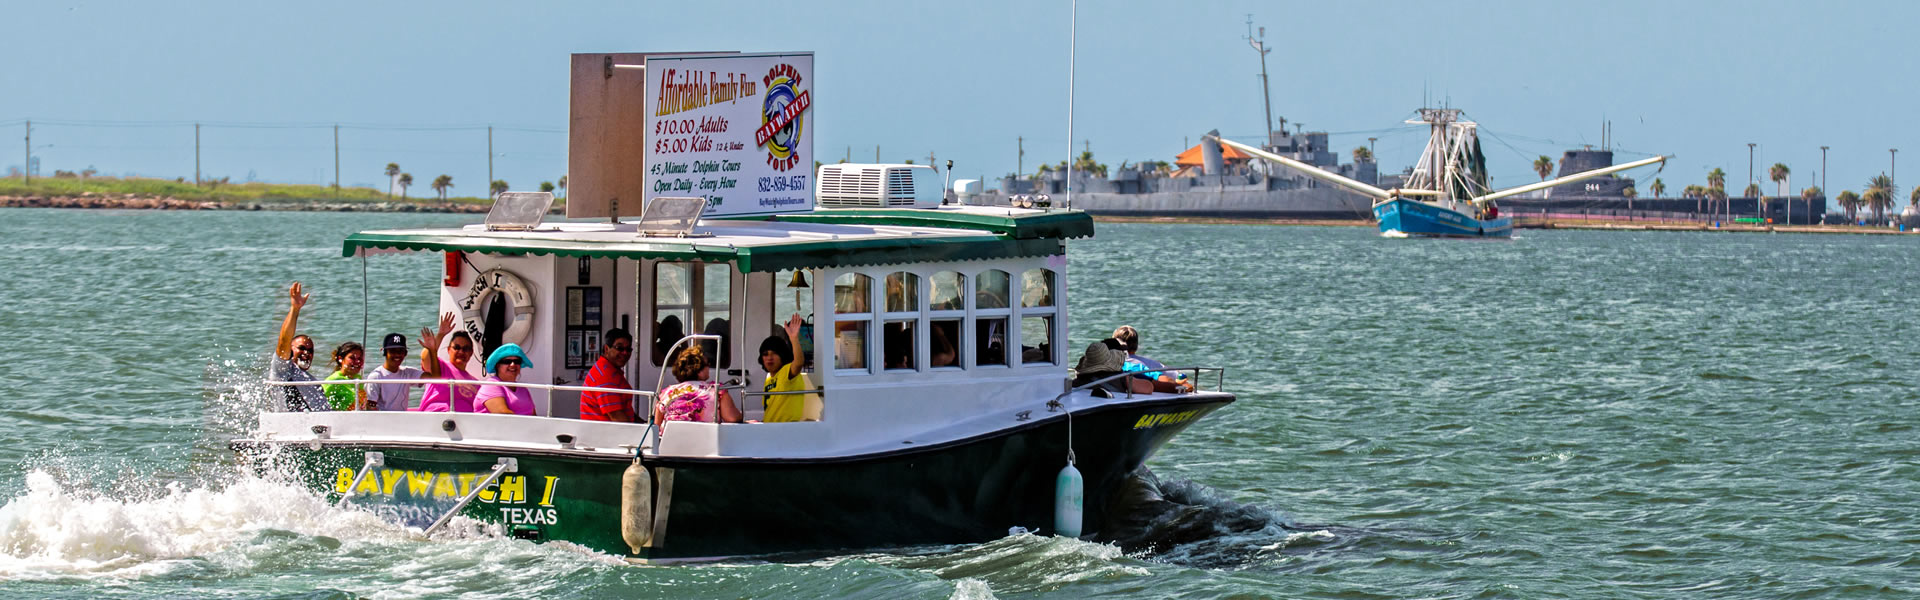 Baywatch Dolphin Tours Galveston